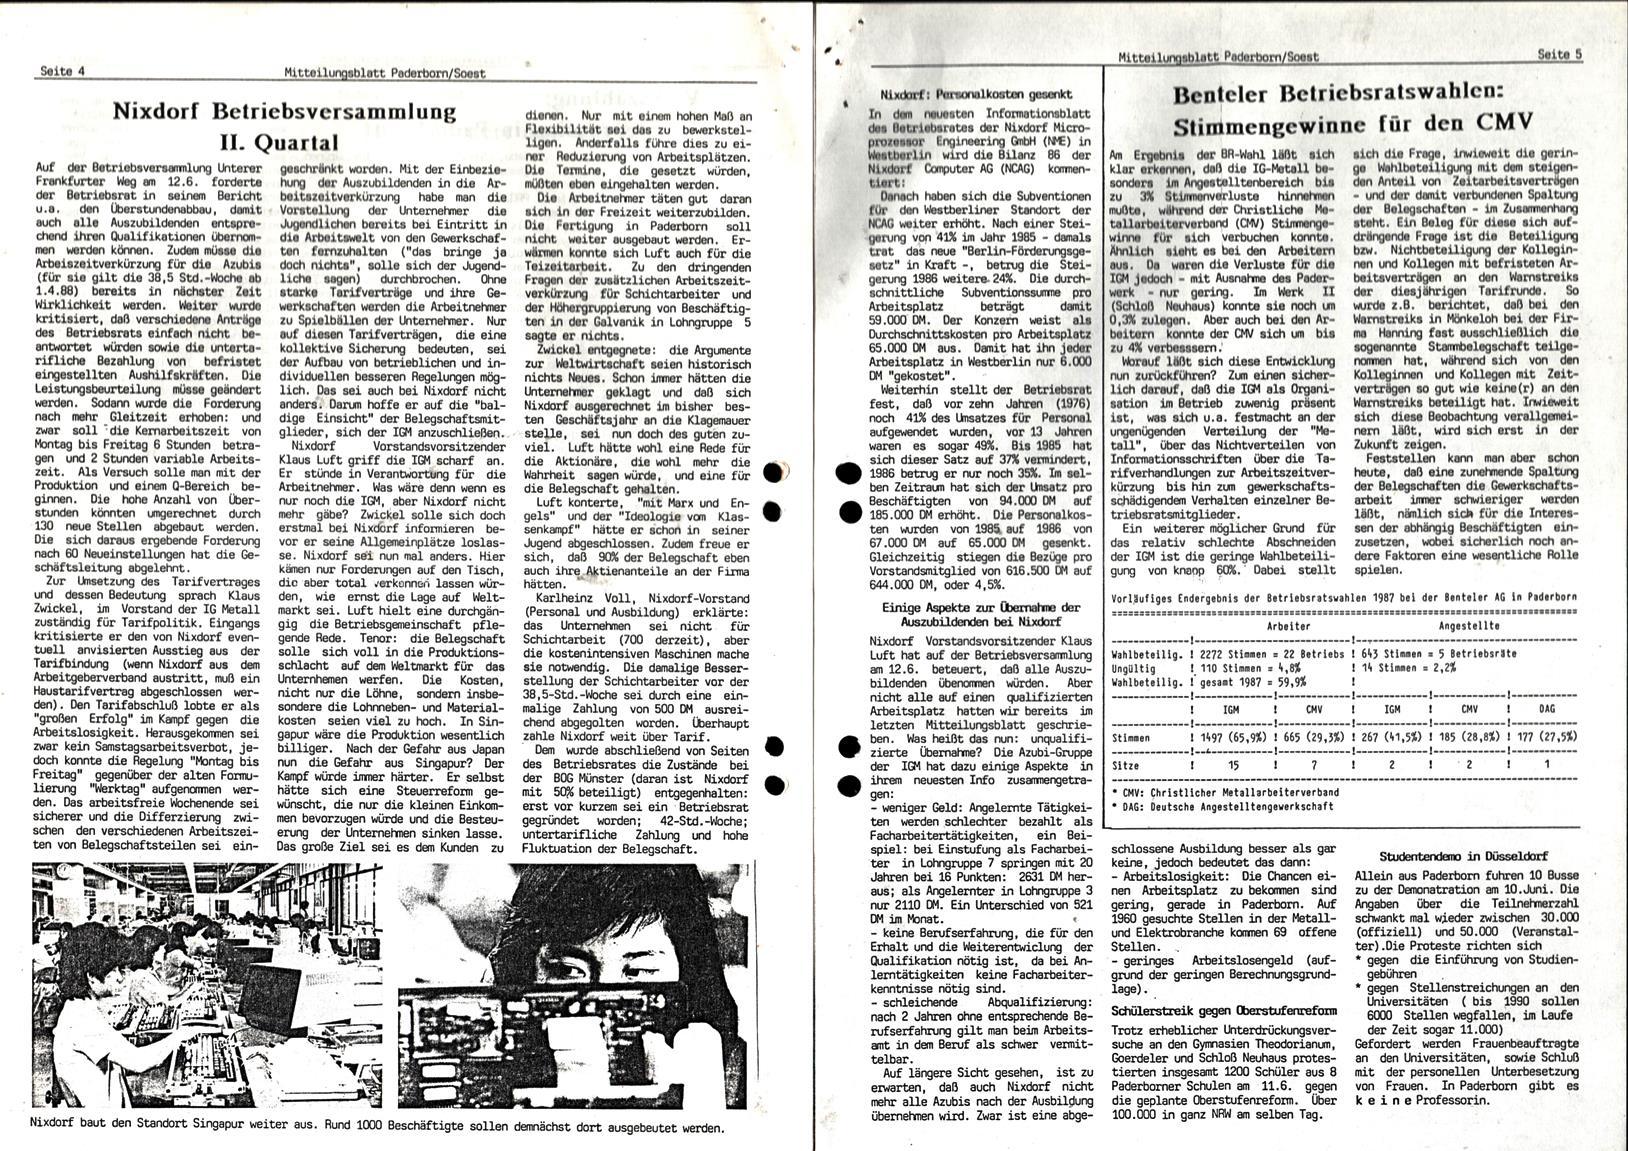 Paderborn_BWK_Mitteilungsblatt_19870615_003